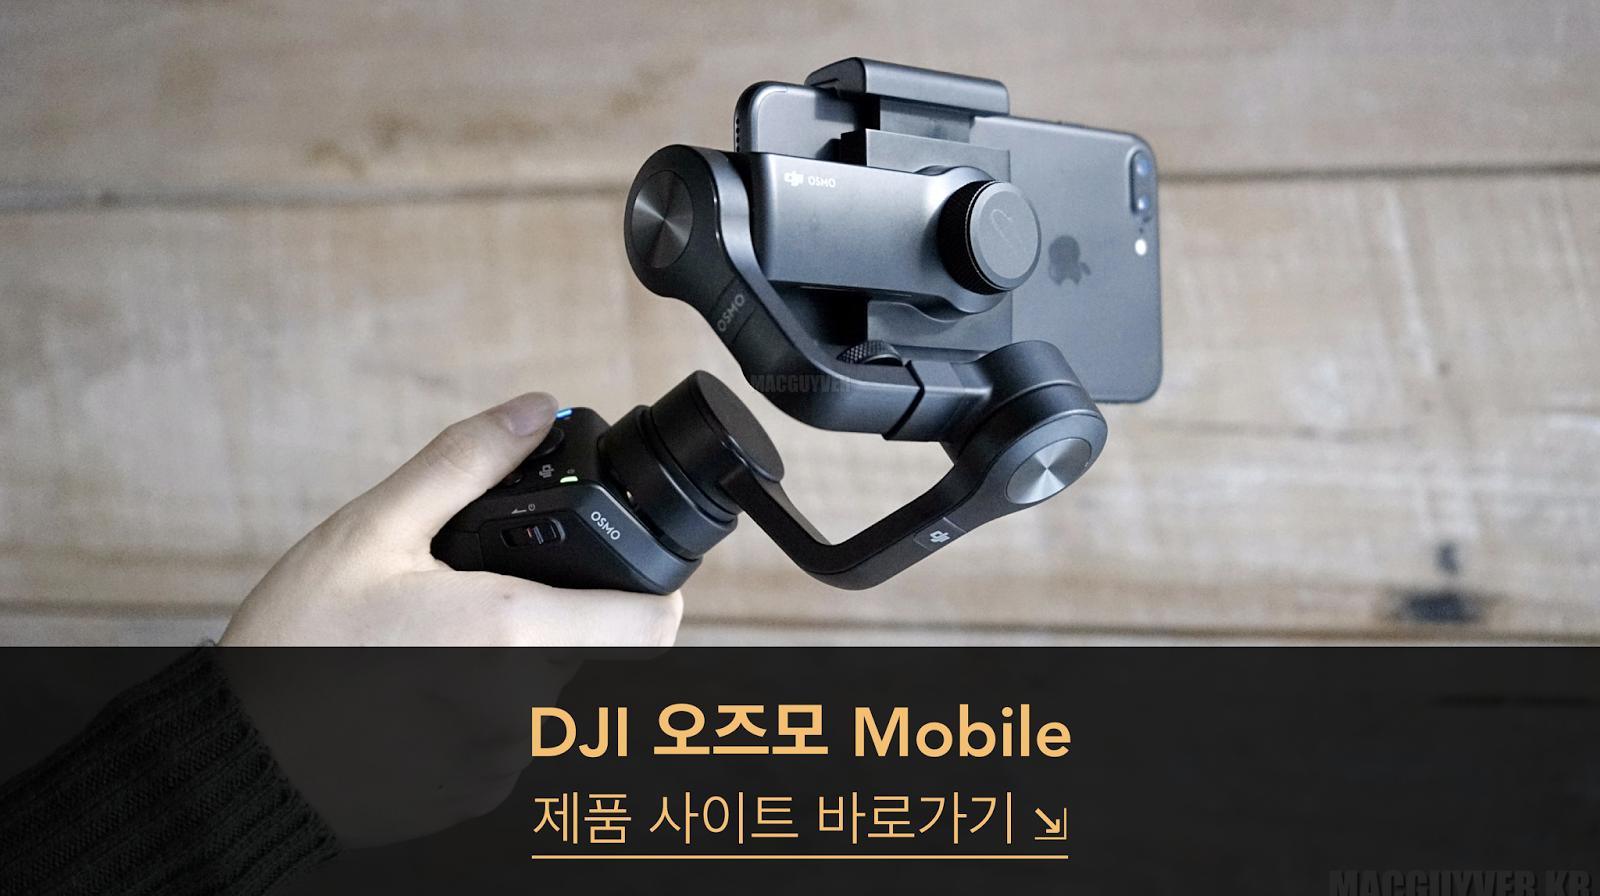 http://store.dji.com/kr/product/osmo-mobile?utm_source=NaverBlog&utm_medium=post&utm_campaign=OsmoMobile